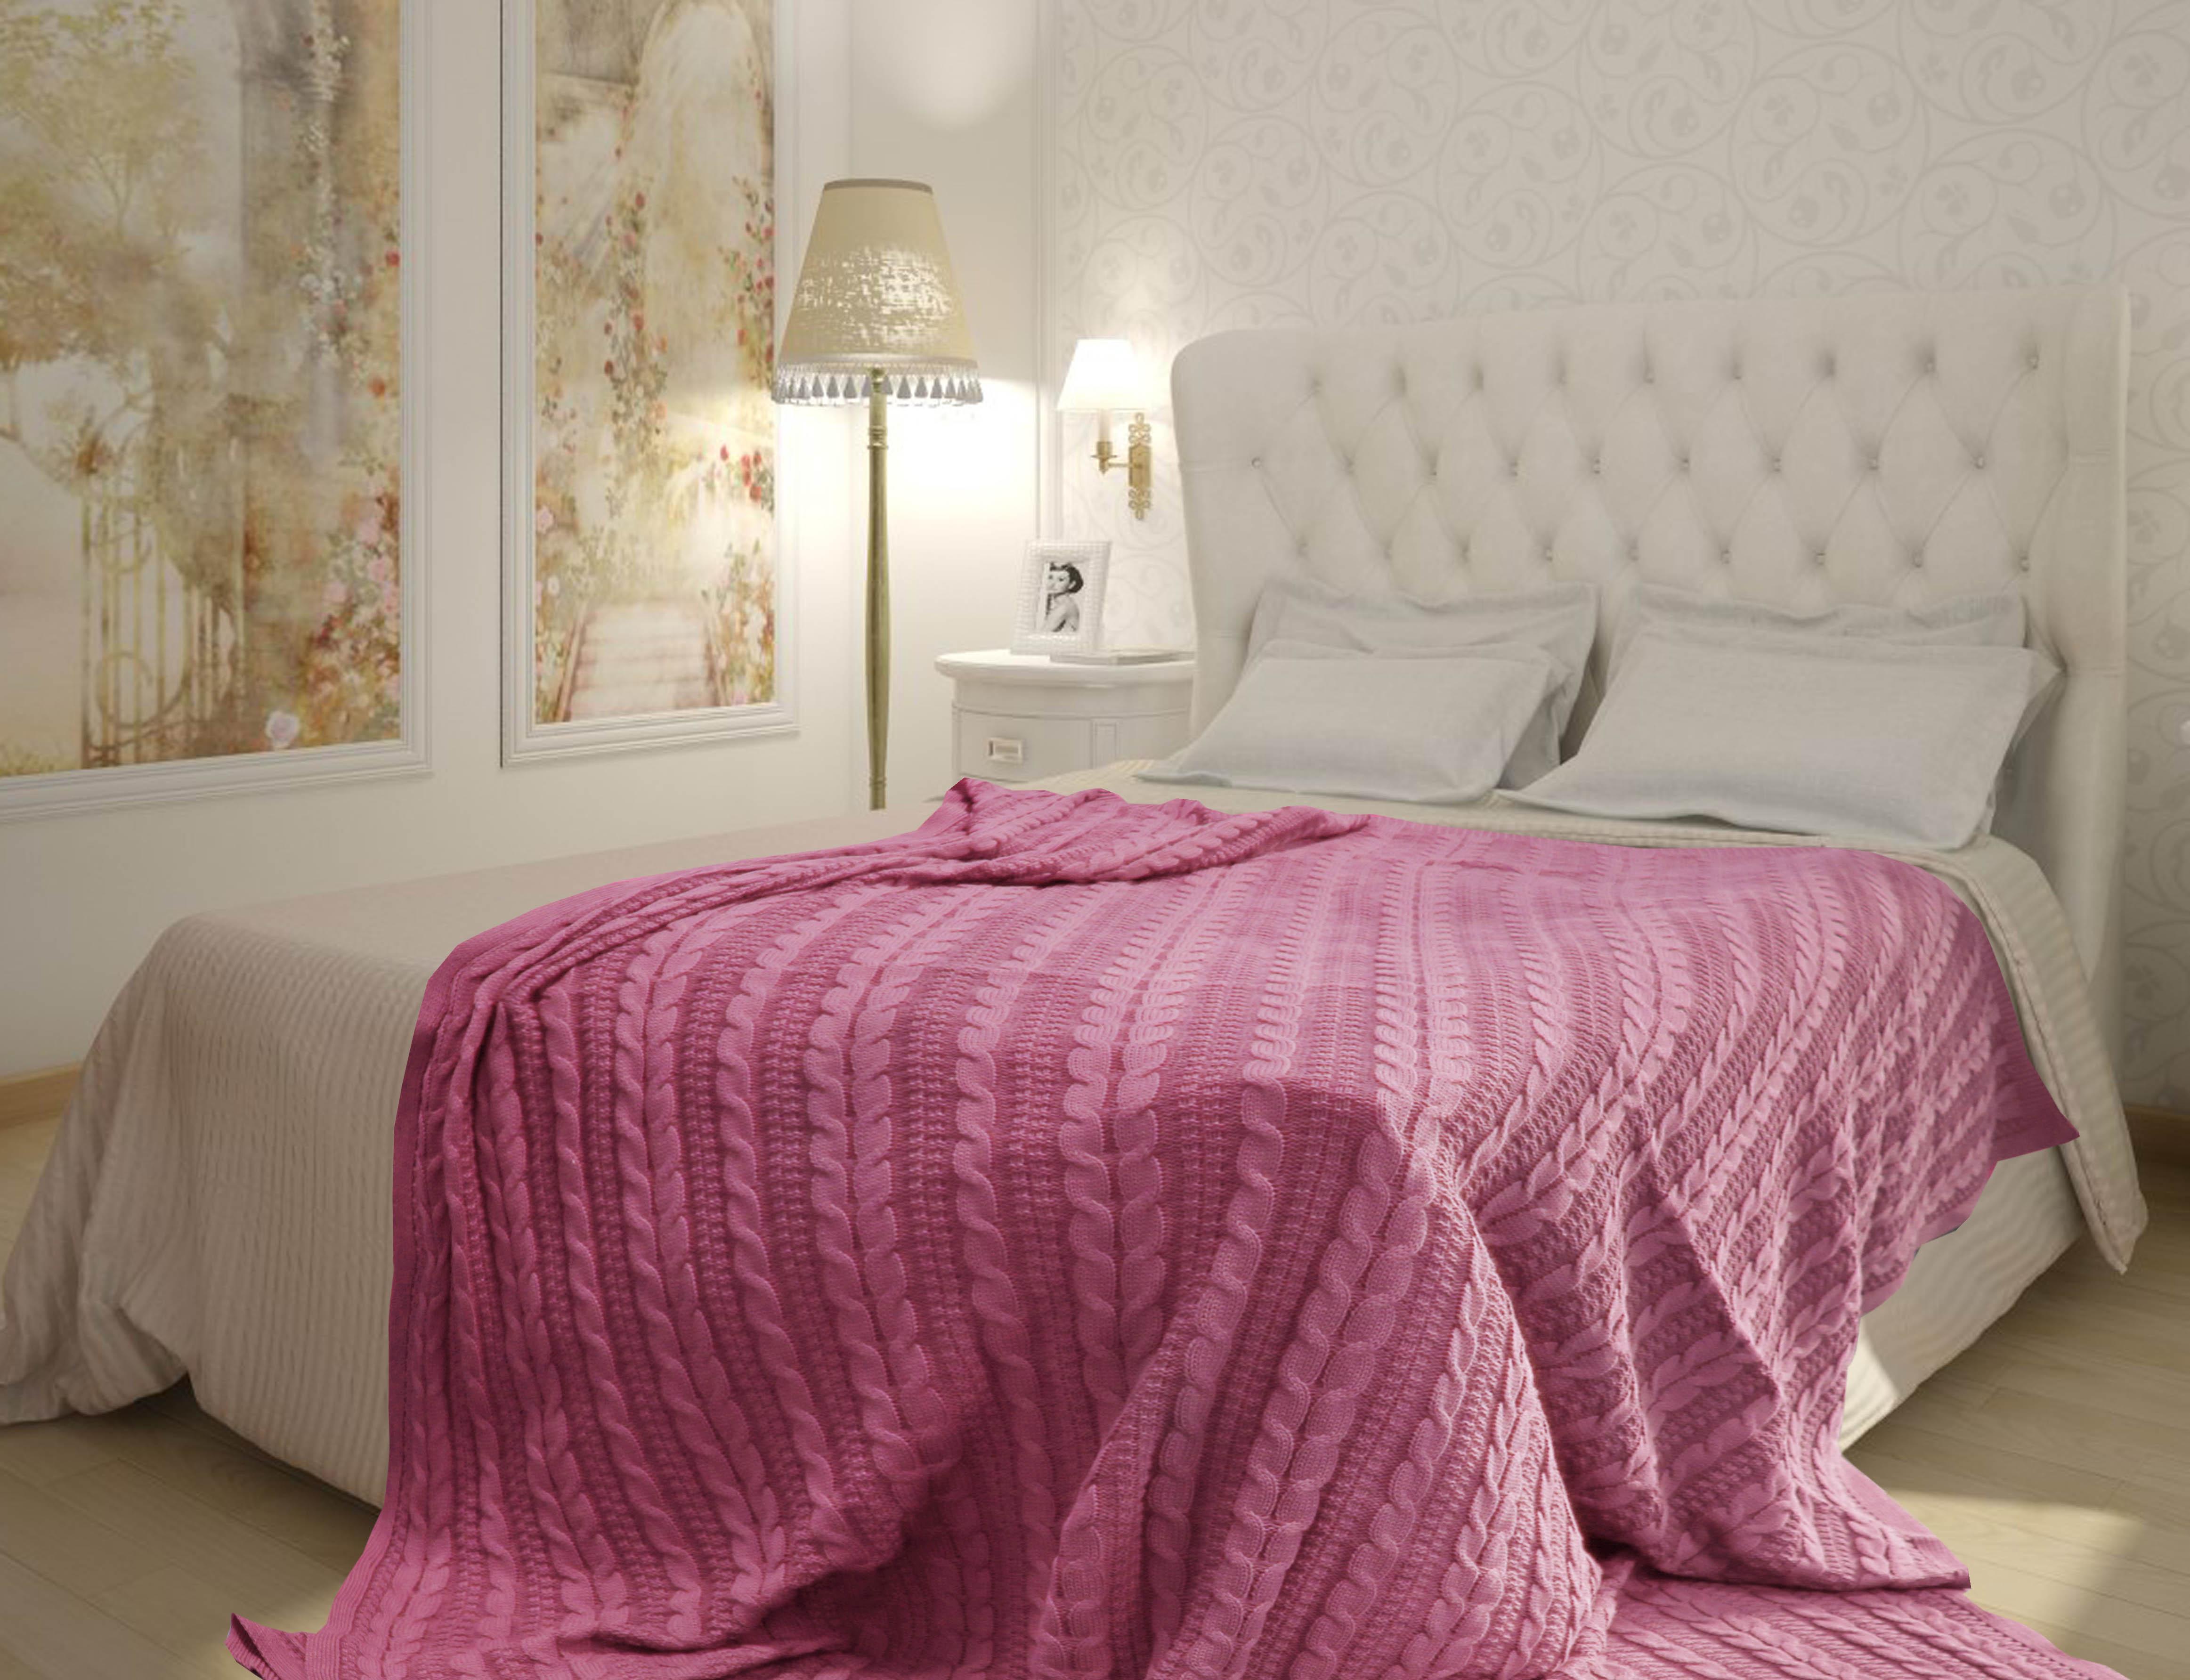 Плед Buenas Noches Плед Braid Цвет: Розовый (180х210 см) плед вязаный buenas noches braid h1 1821